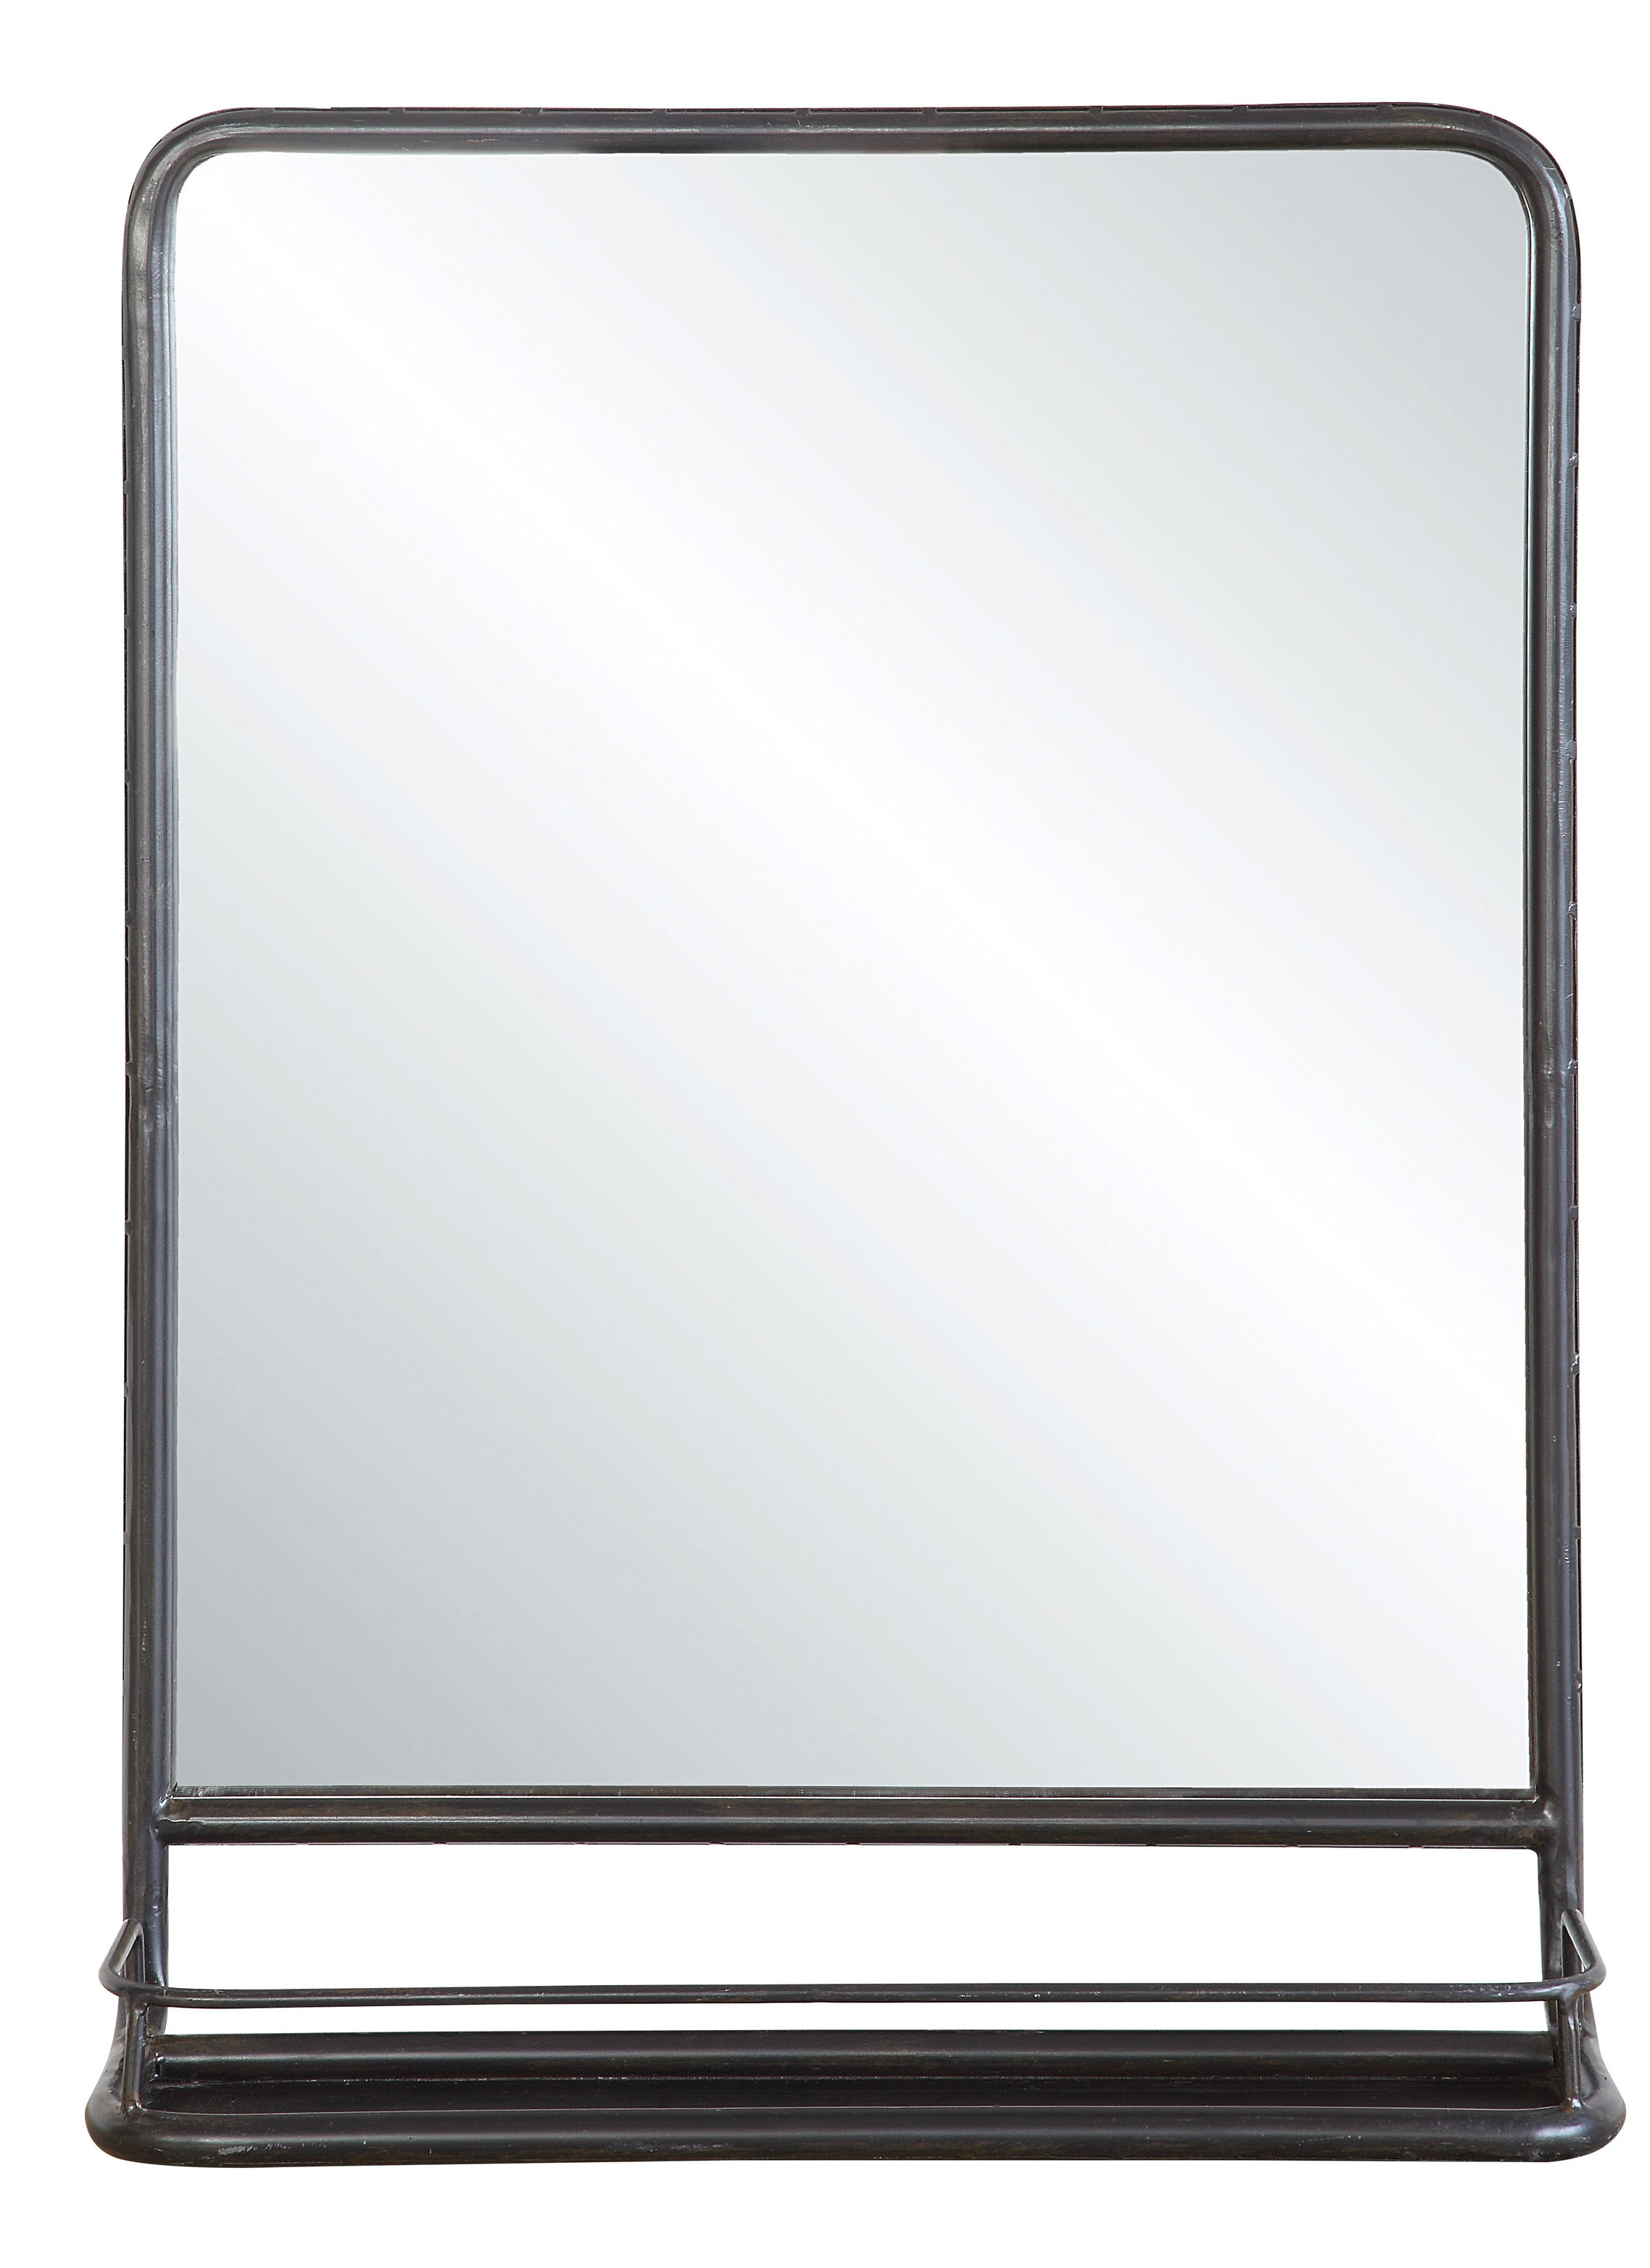 Peetz Modern Rustic Accent Mirror Regarding Peetz Modern Rustic Accent Mirrors (View 4 of 30)